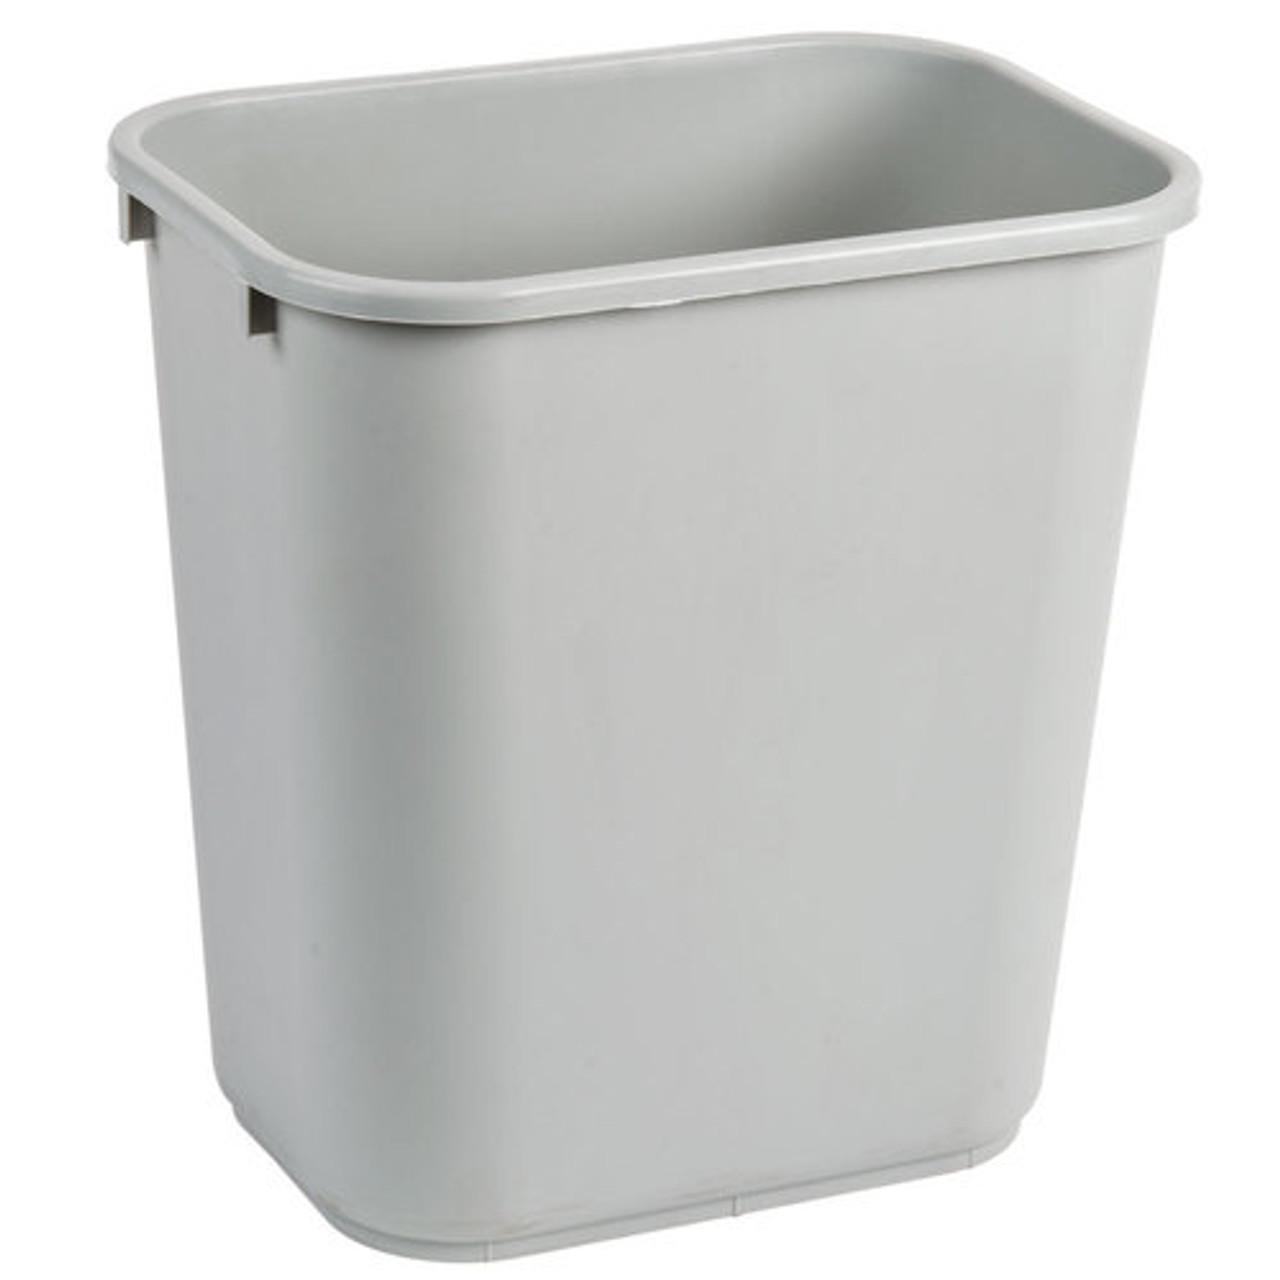 28 Quart Home or Office Plastic Wastebasket Gray